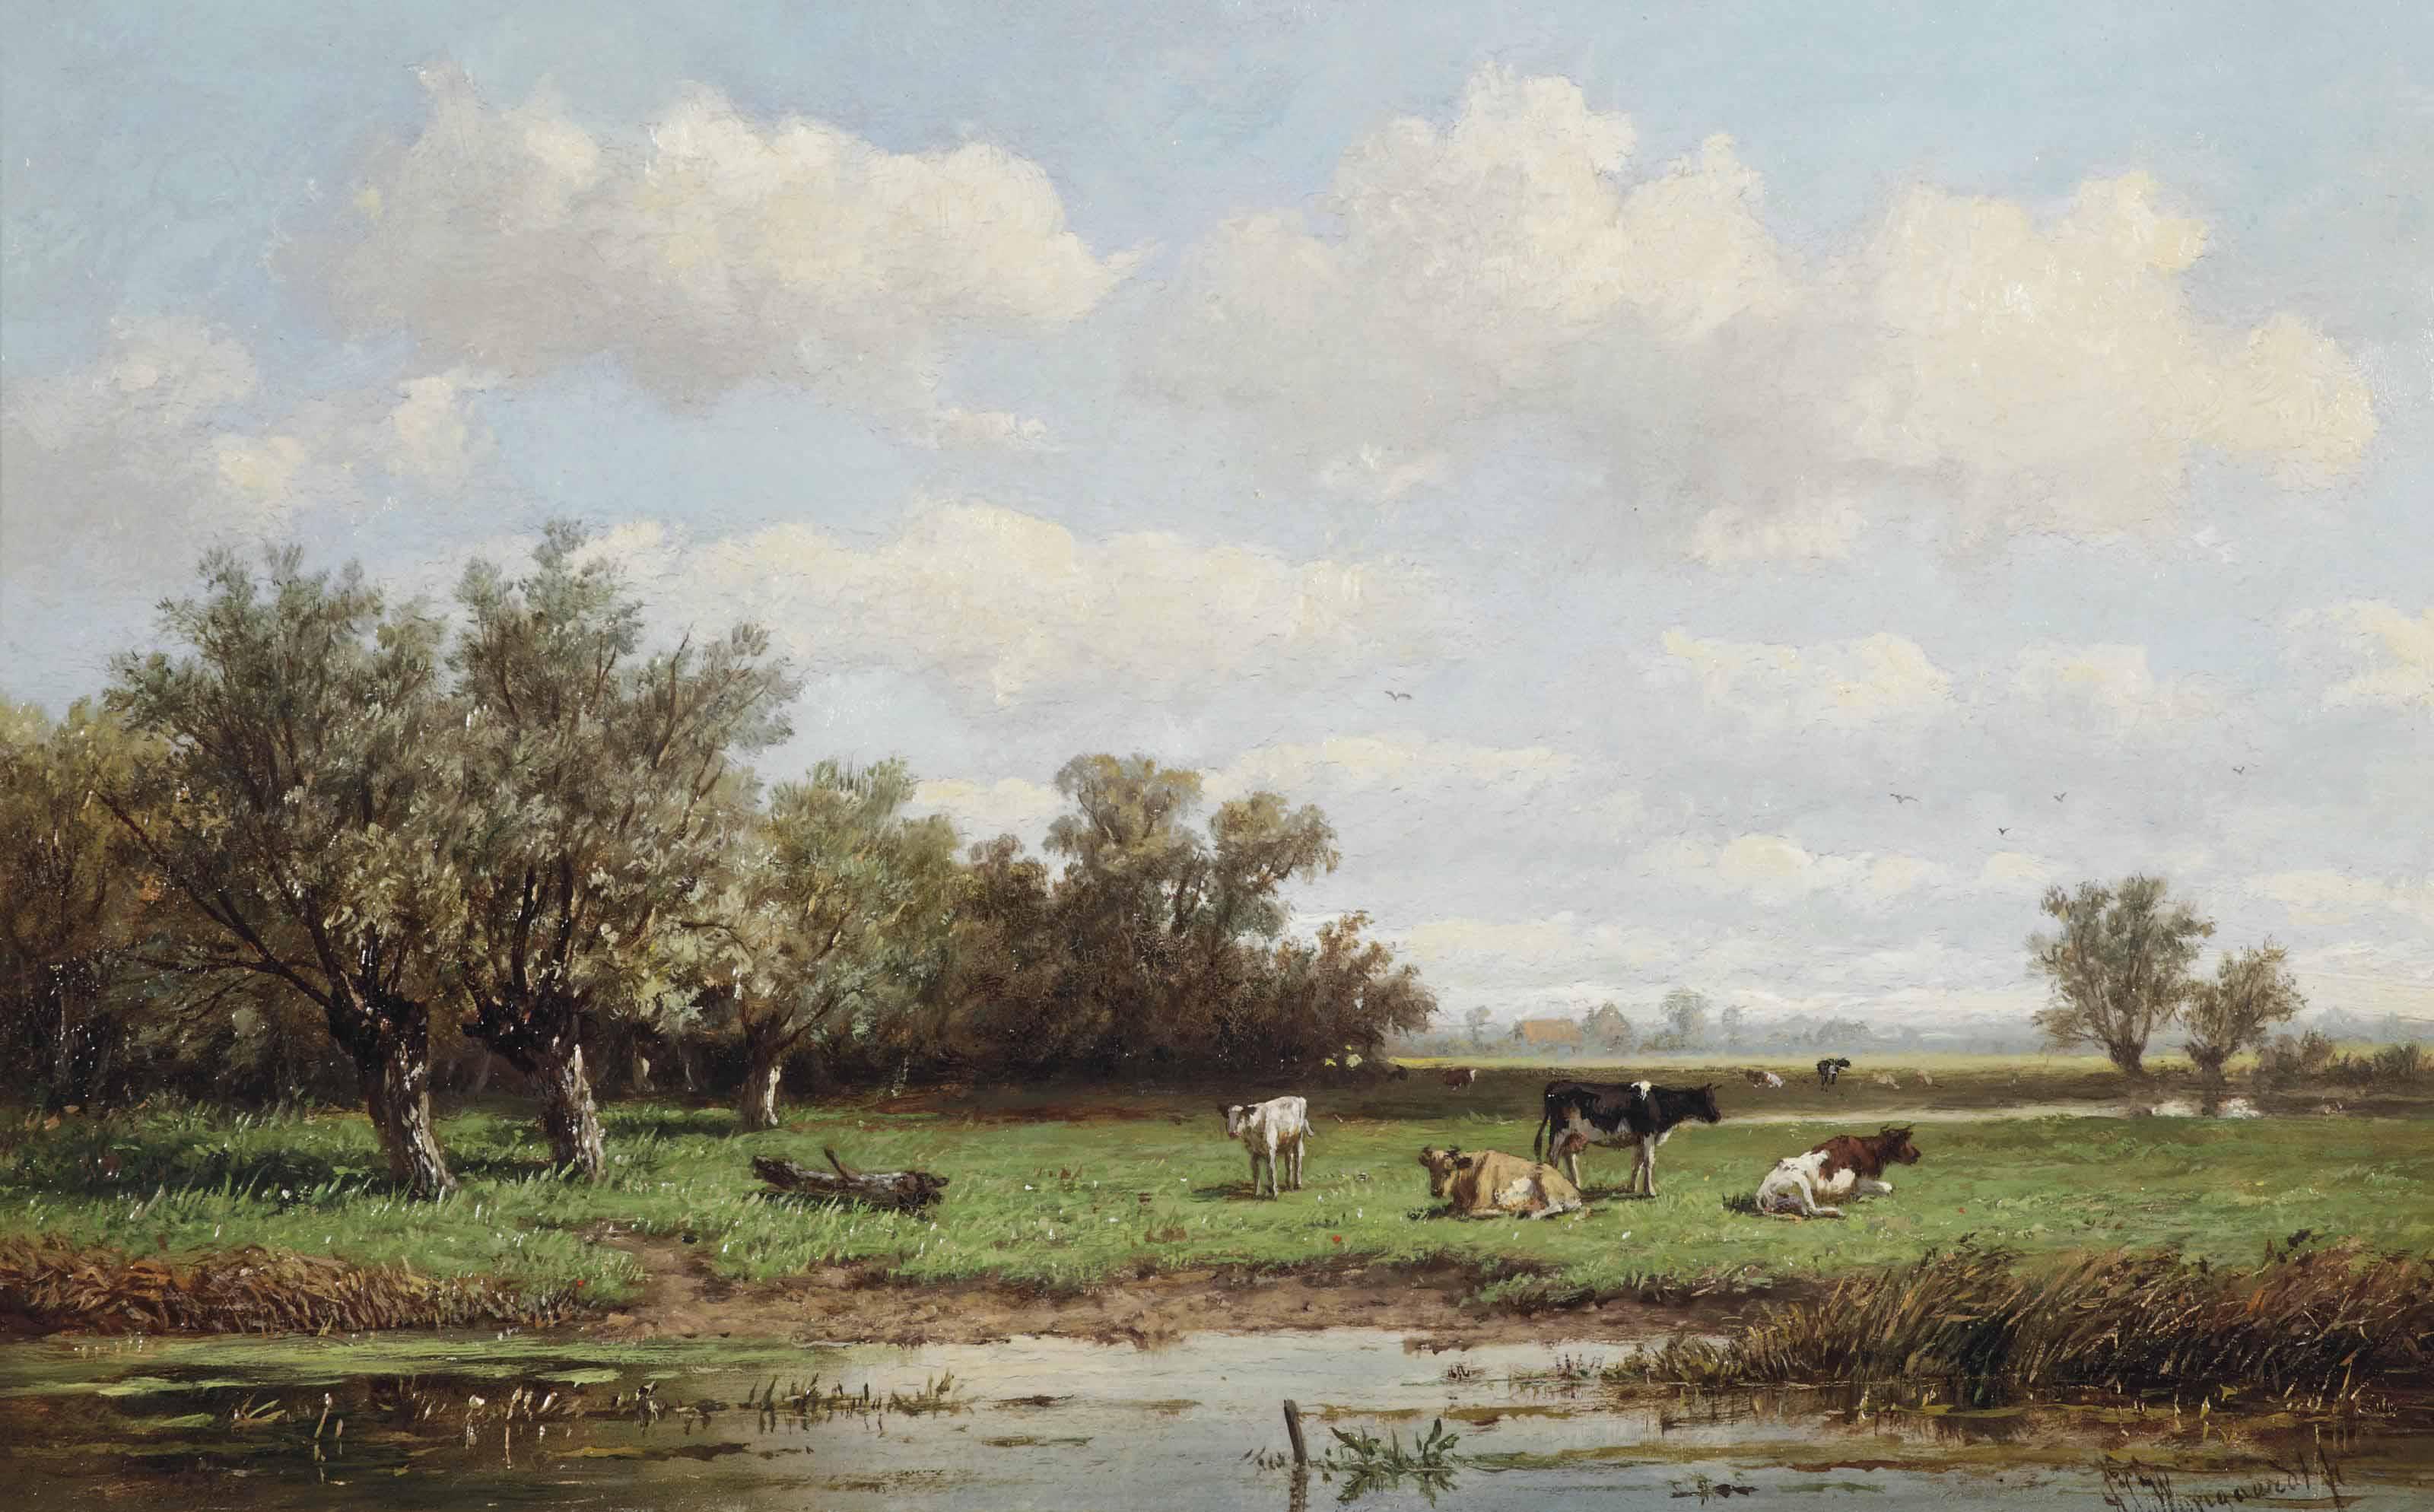 Cattle in a summer polder landscape